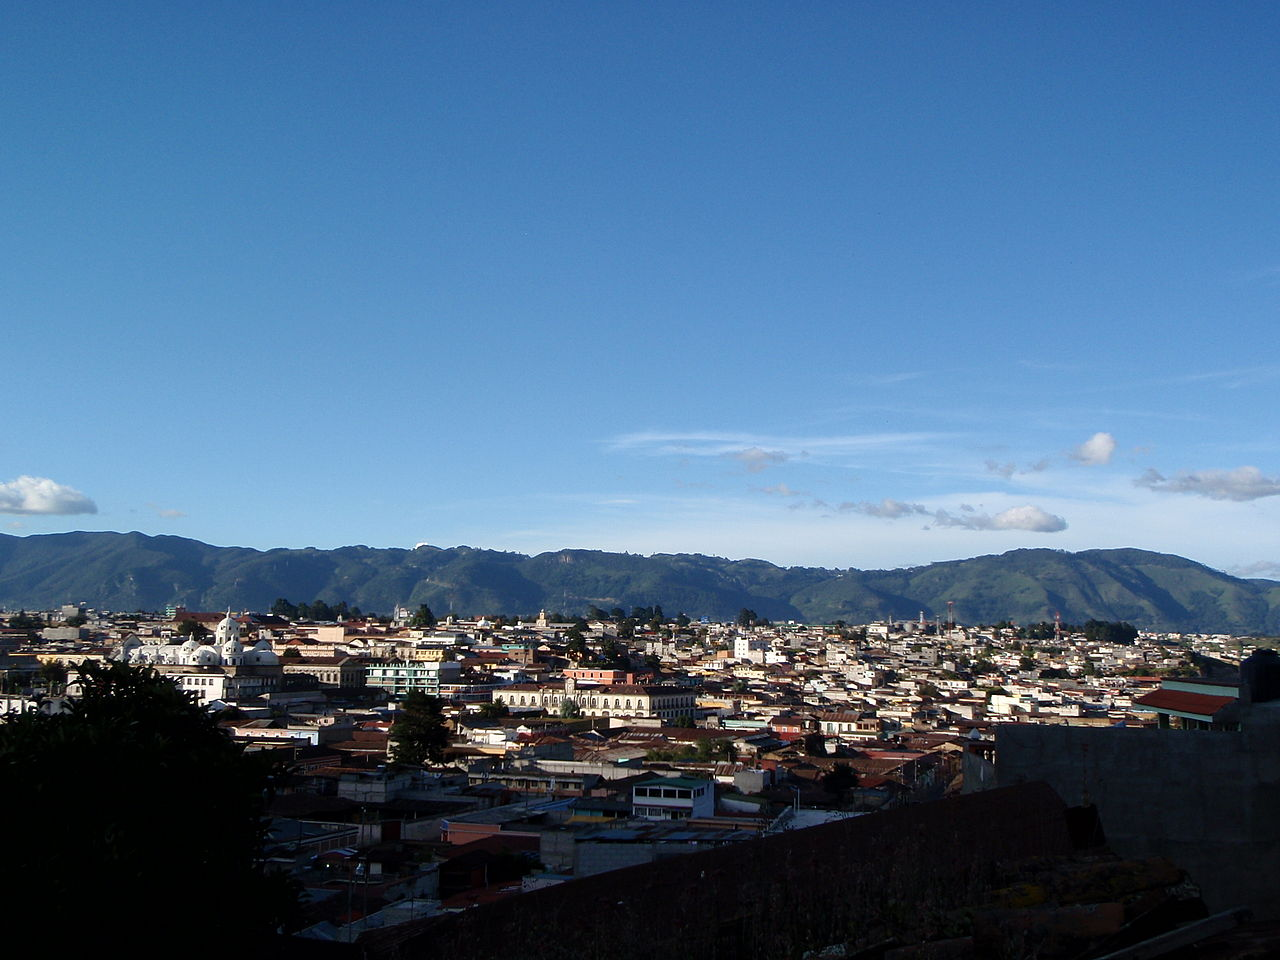 1280px-Quetzaltenango_skyline_2009.JPG